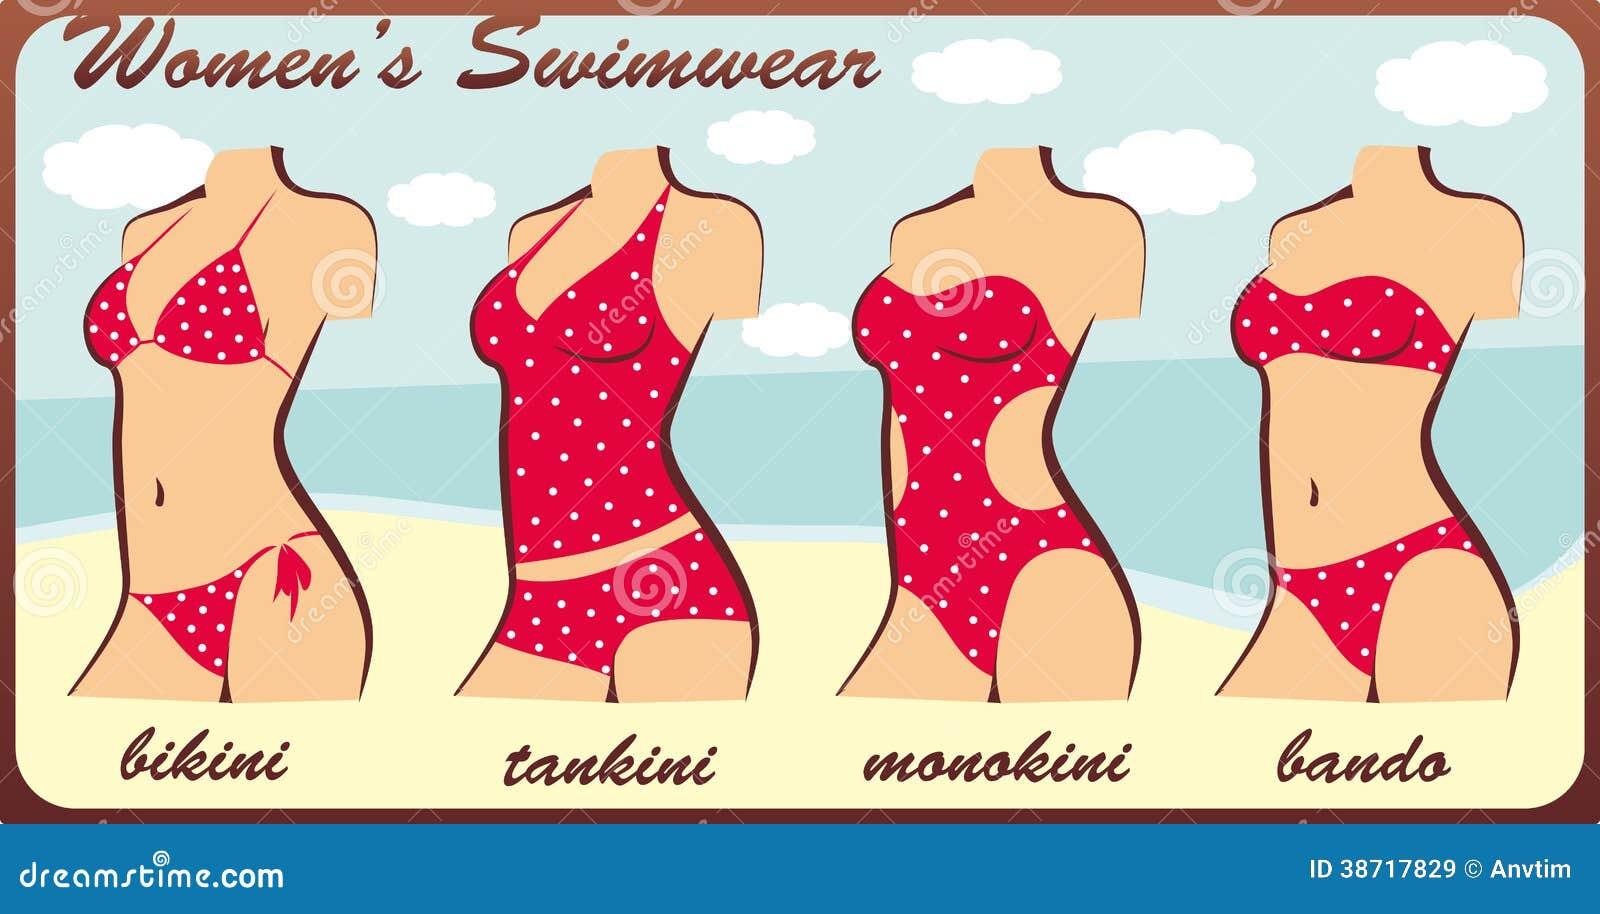 Imagenes De Baño Para Mujeres:Silhouette Swimwear